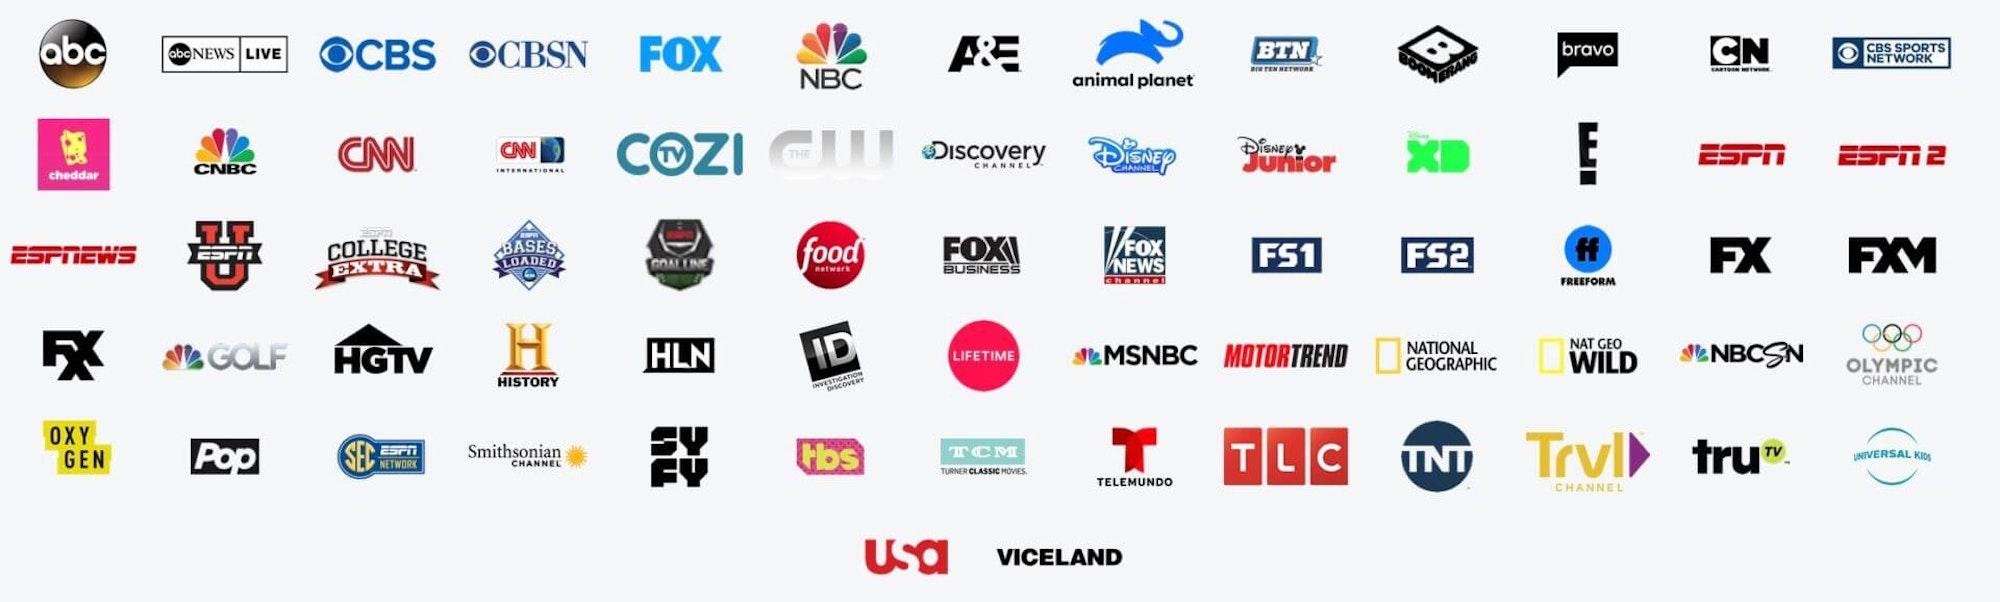 watch the simpsons season 31 on Hulu with Live TV